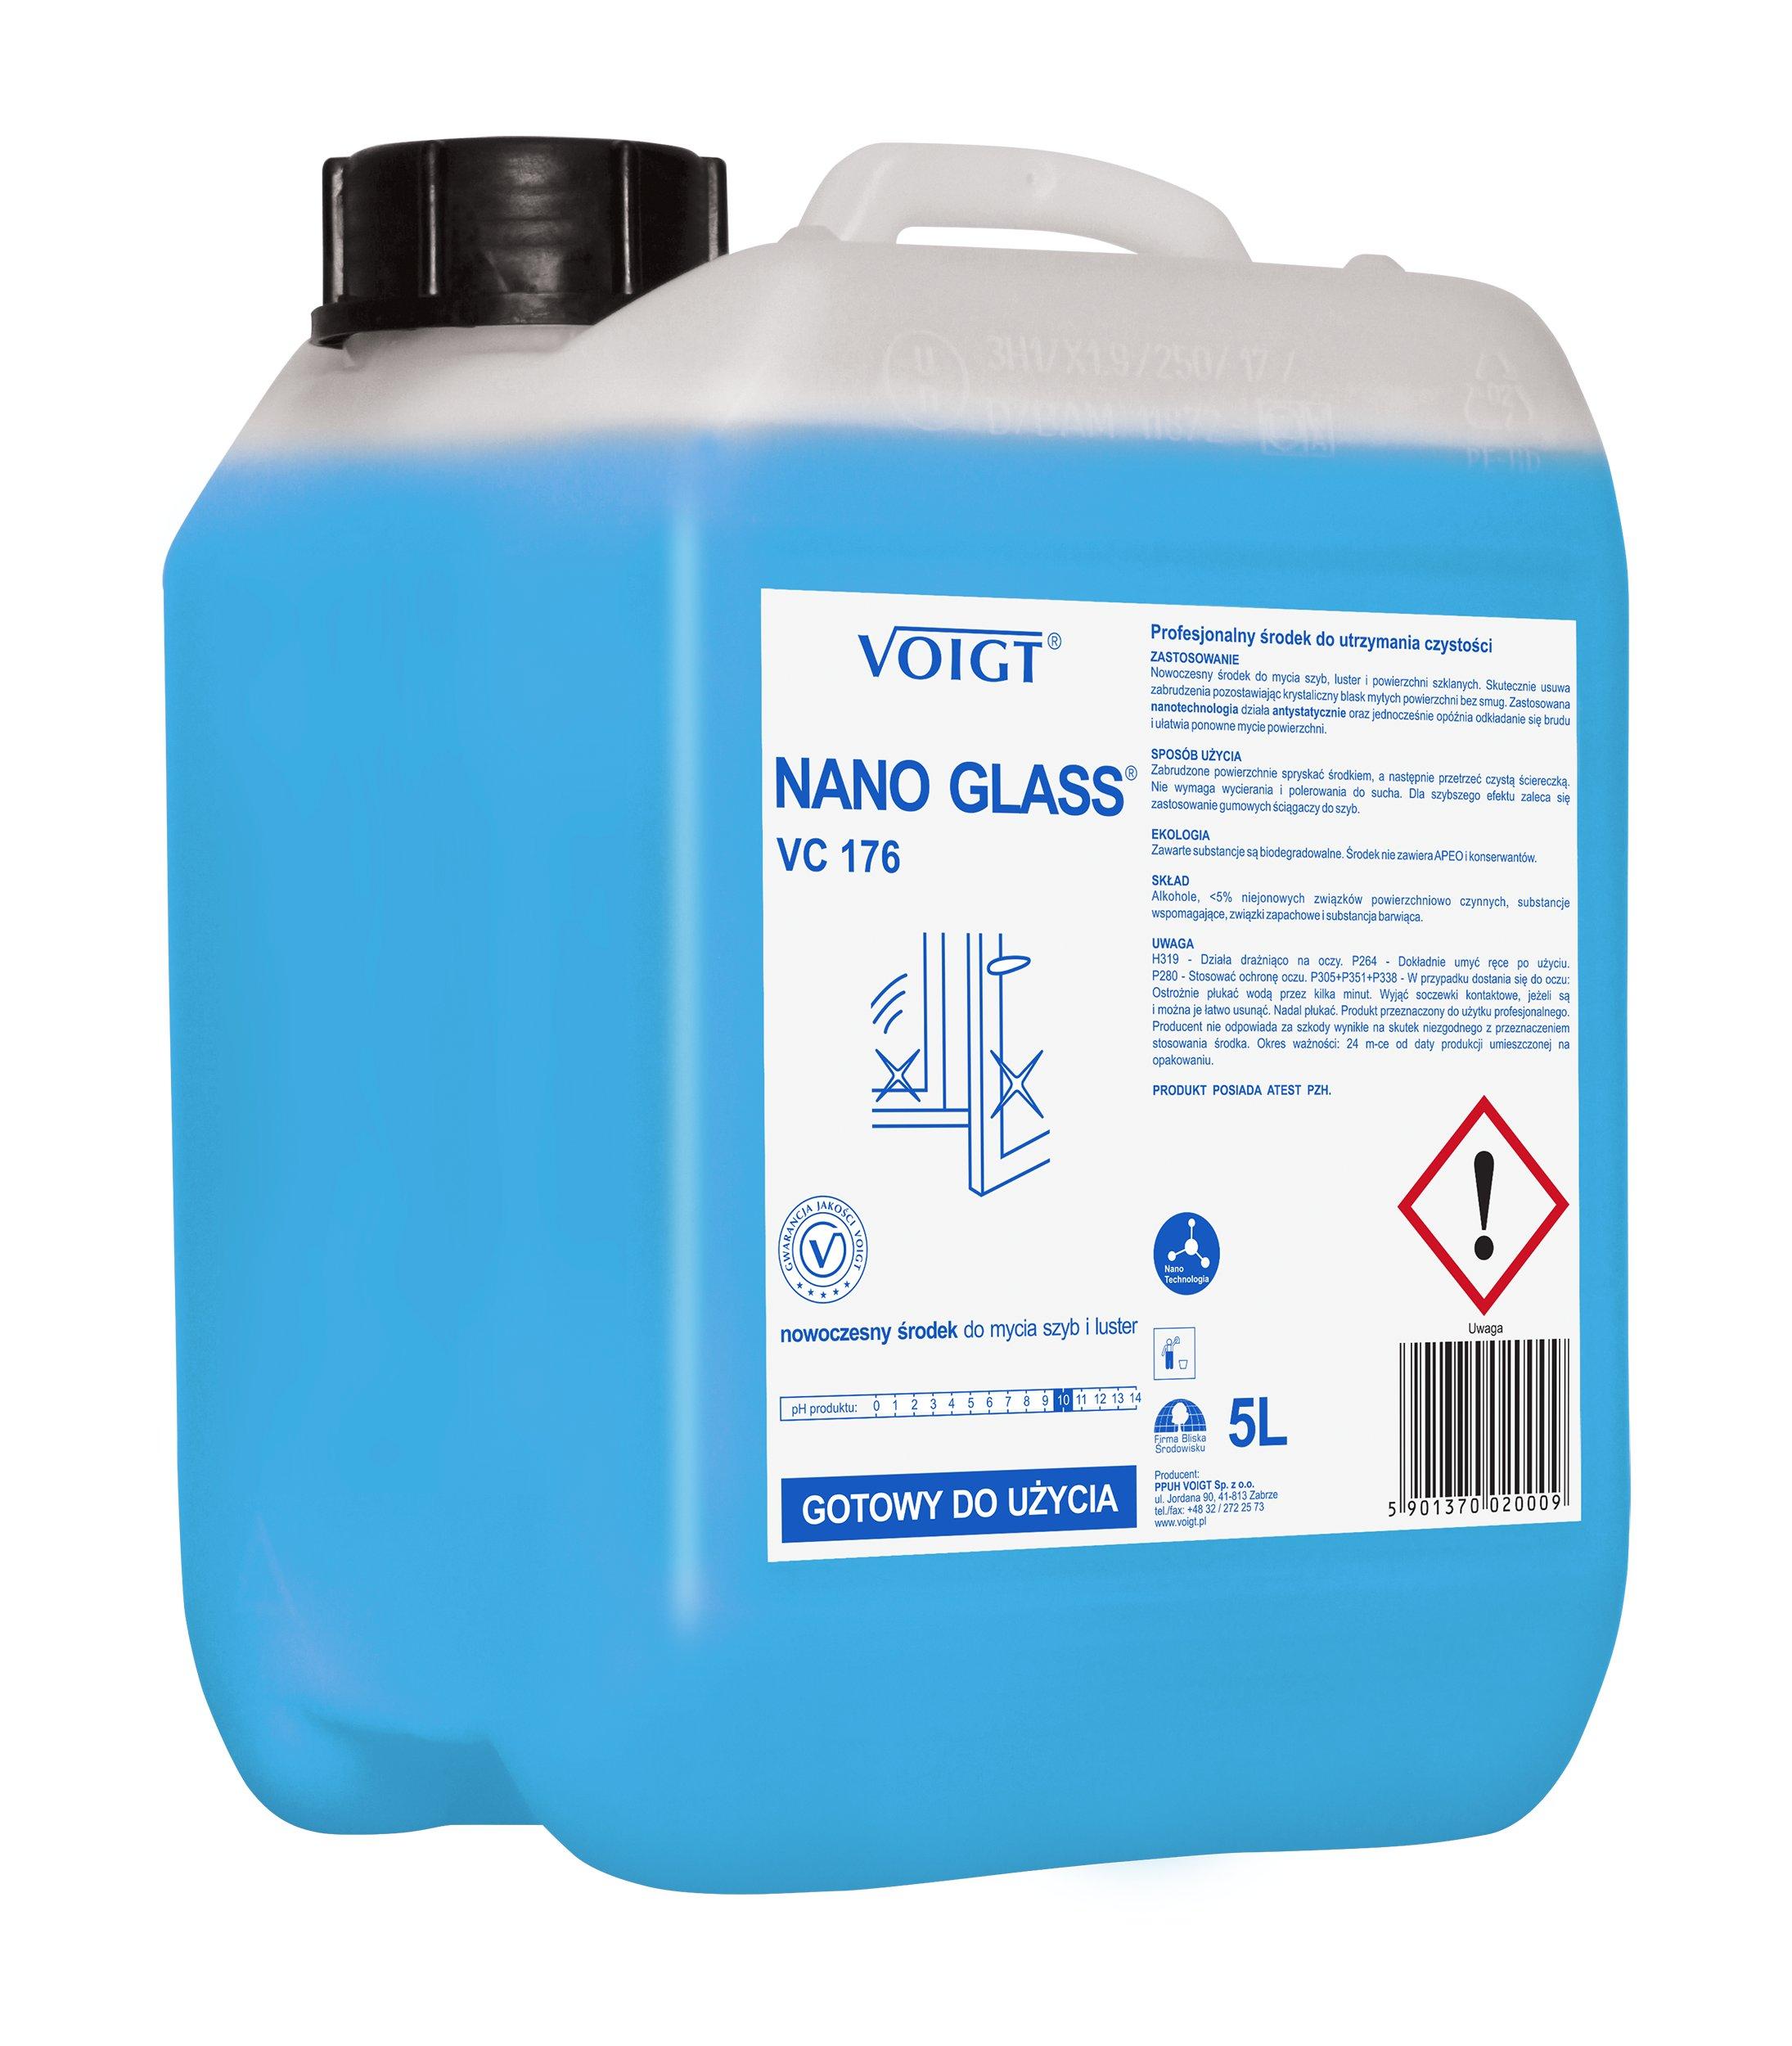 ФОЙТ NANO GLASS VC 176 5л для мытья стекол без разводов